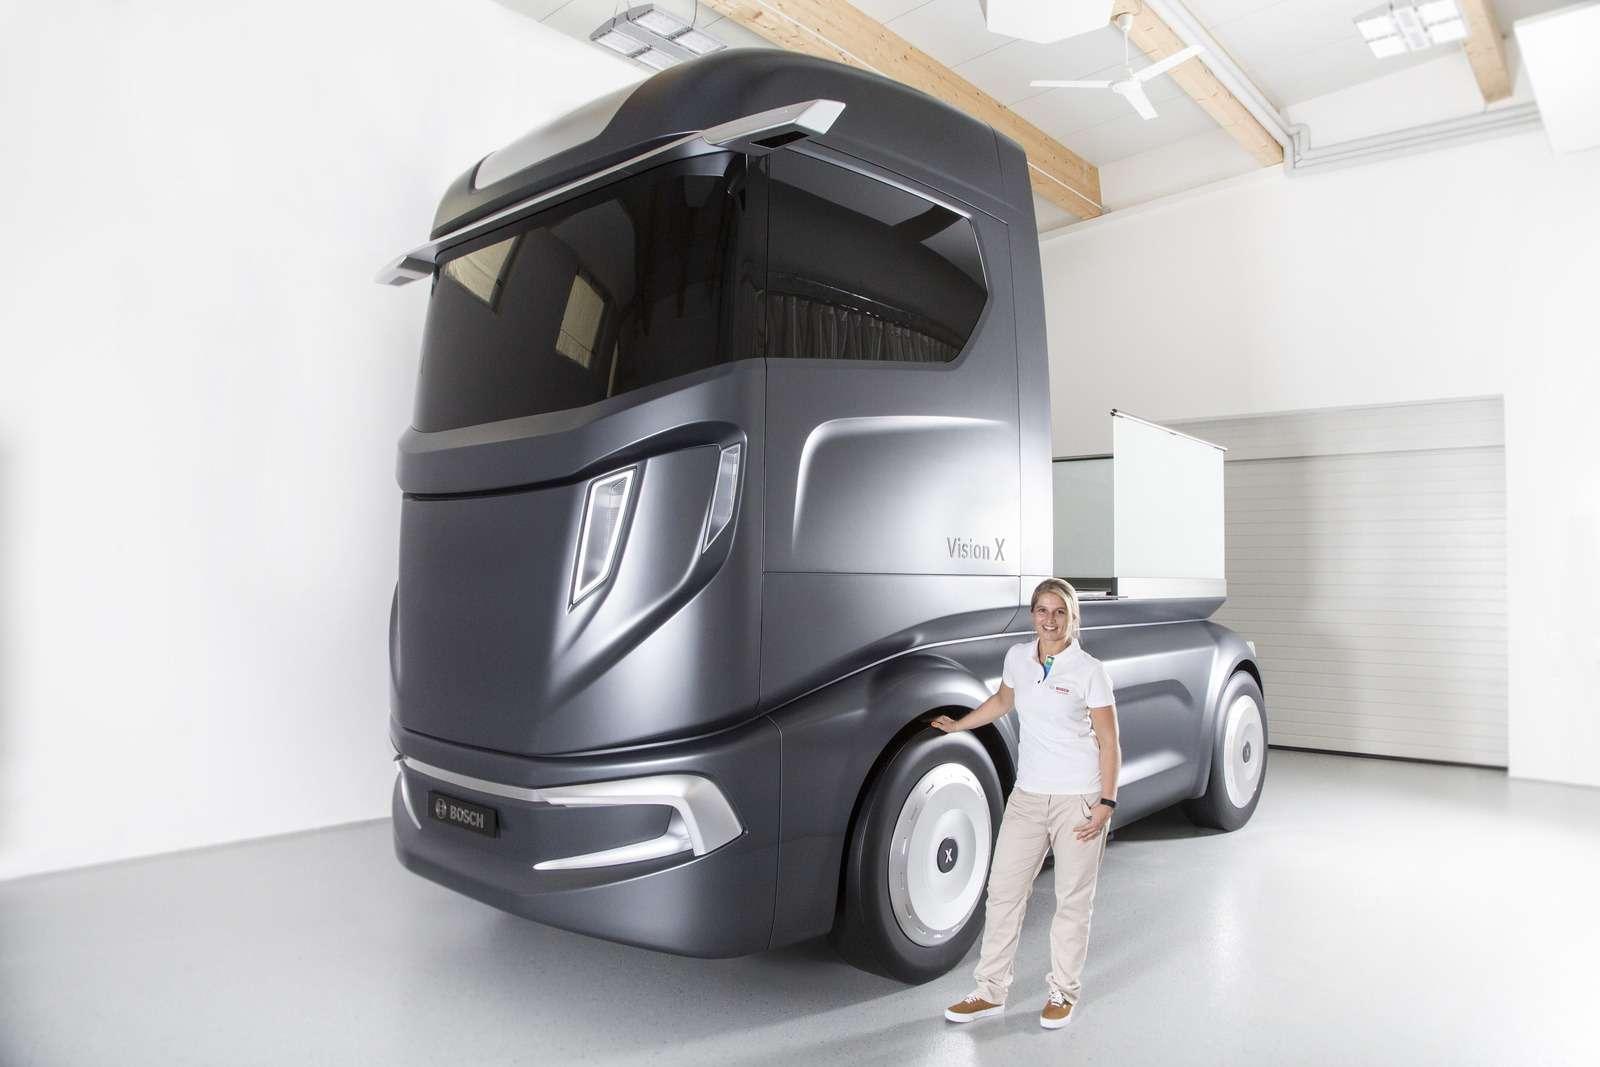 Концепт Bosch VisionX научили ходить встрою— фото 637805